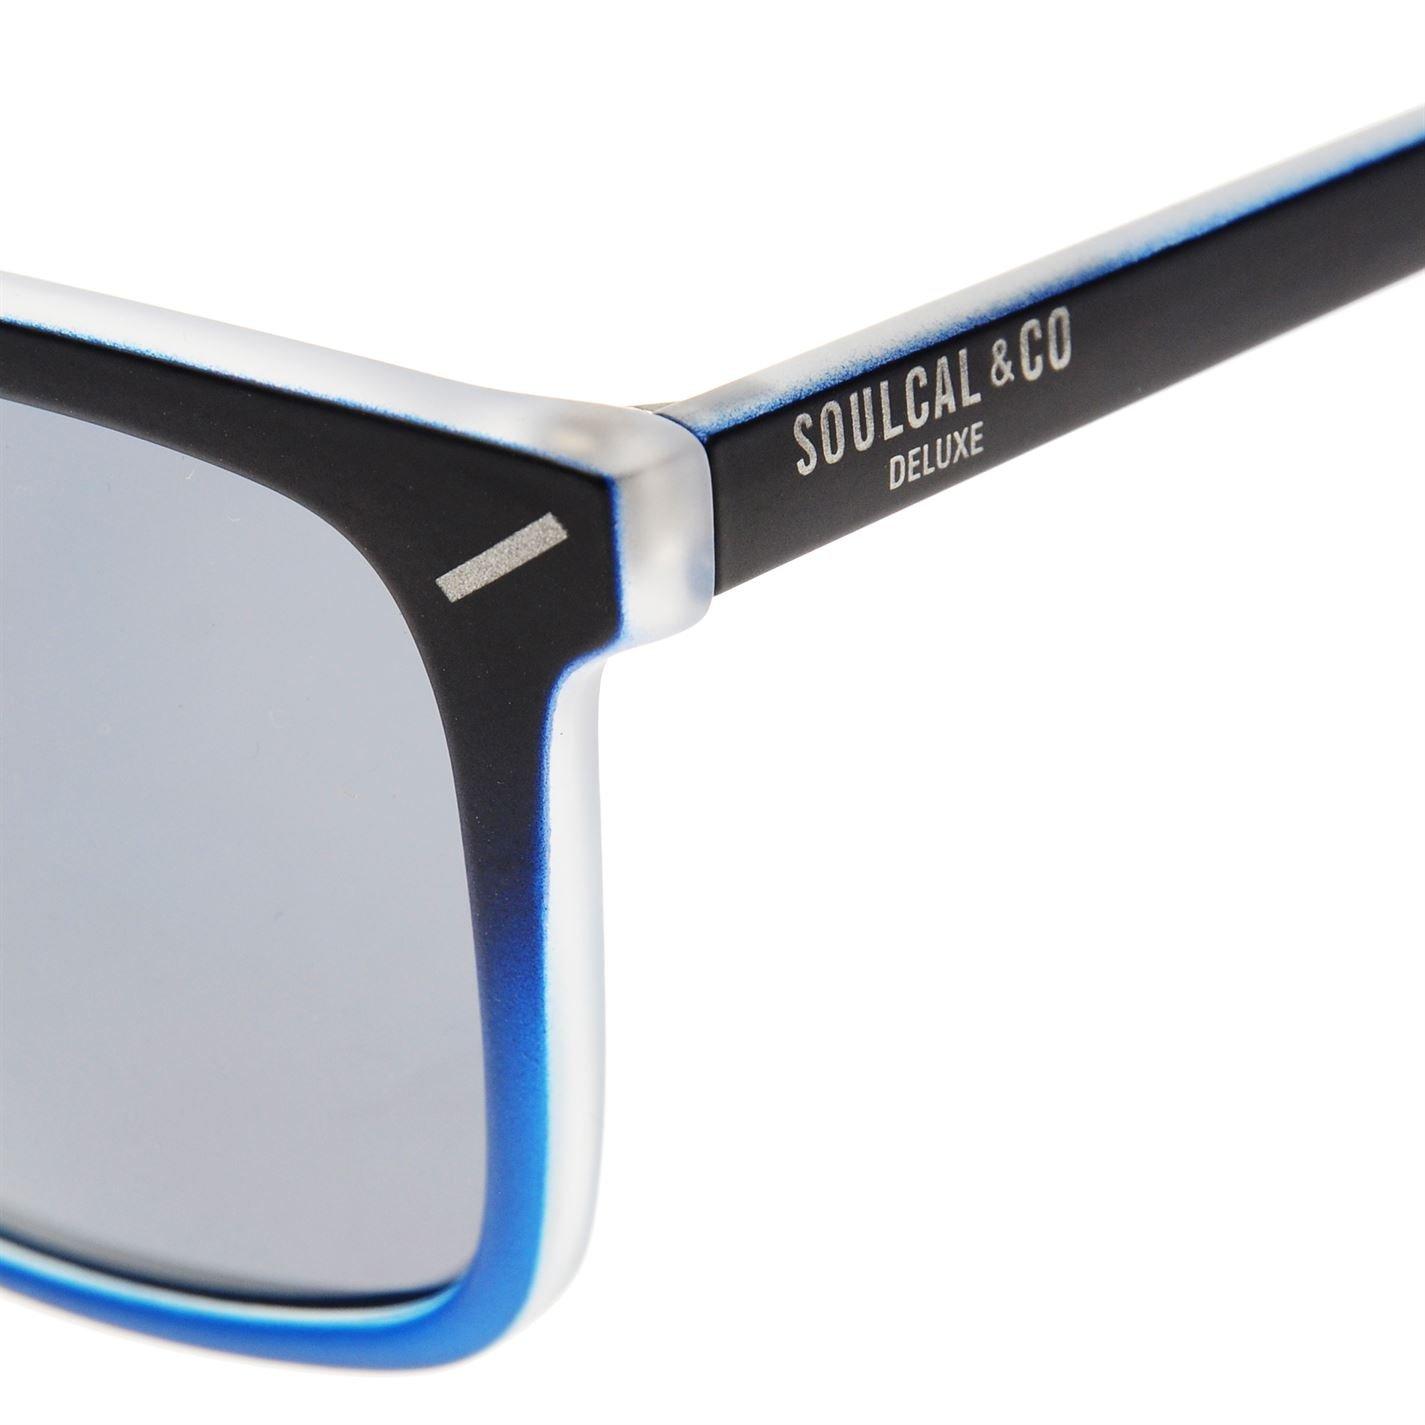 SoulCal Mens Bermuda Sunglasses Navy Black  Amazon.co.uk  Clothing 15ed5afa47